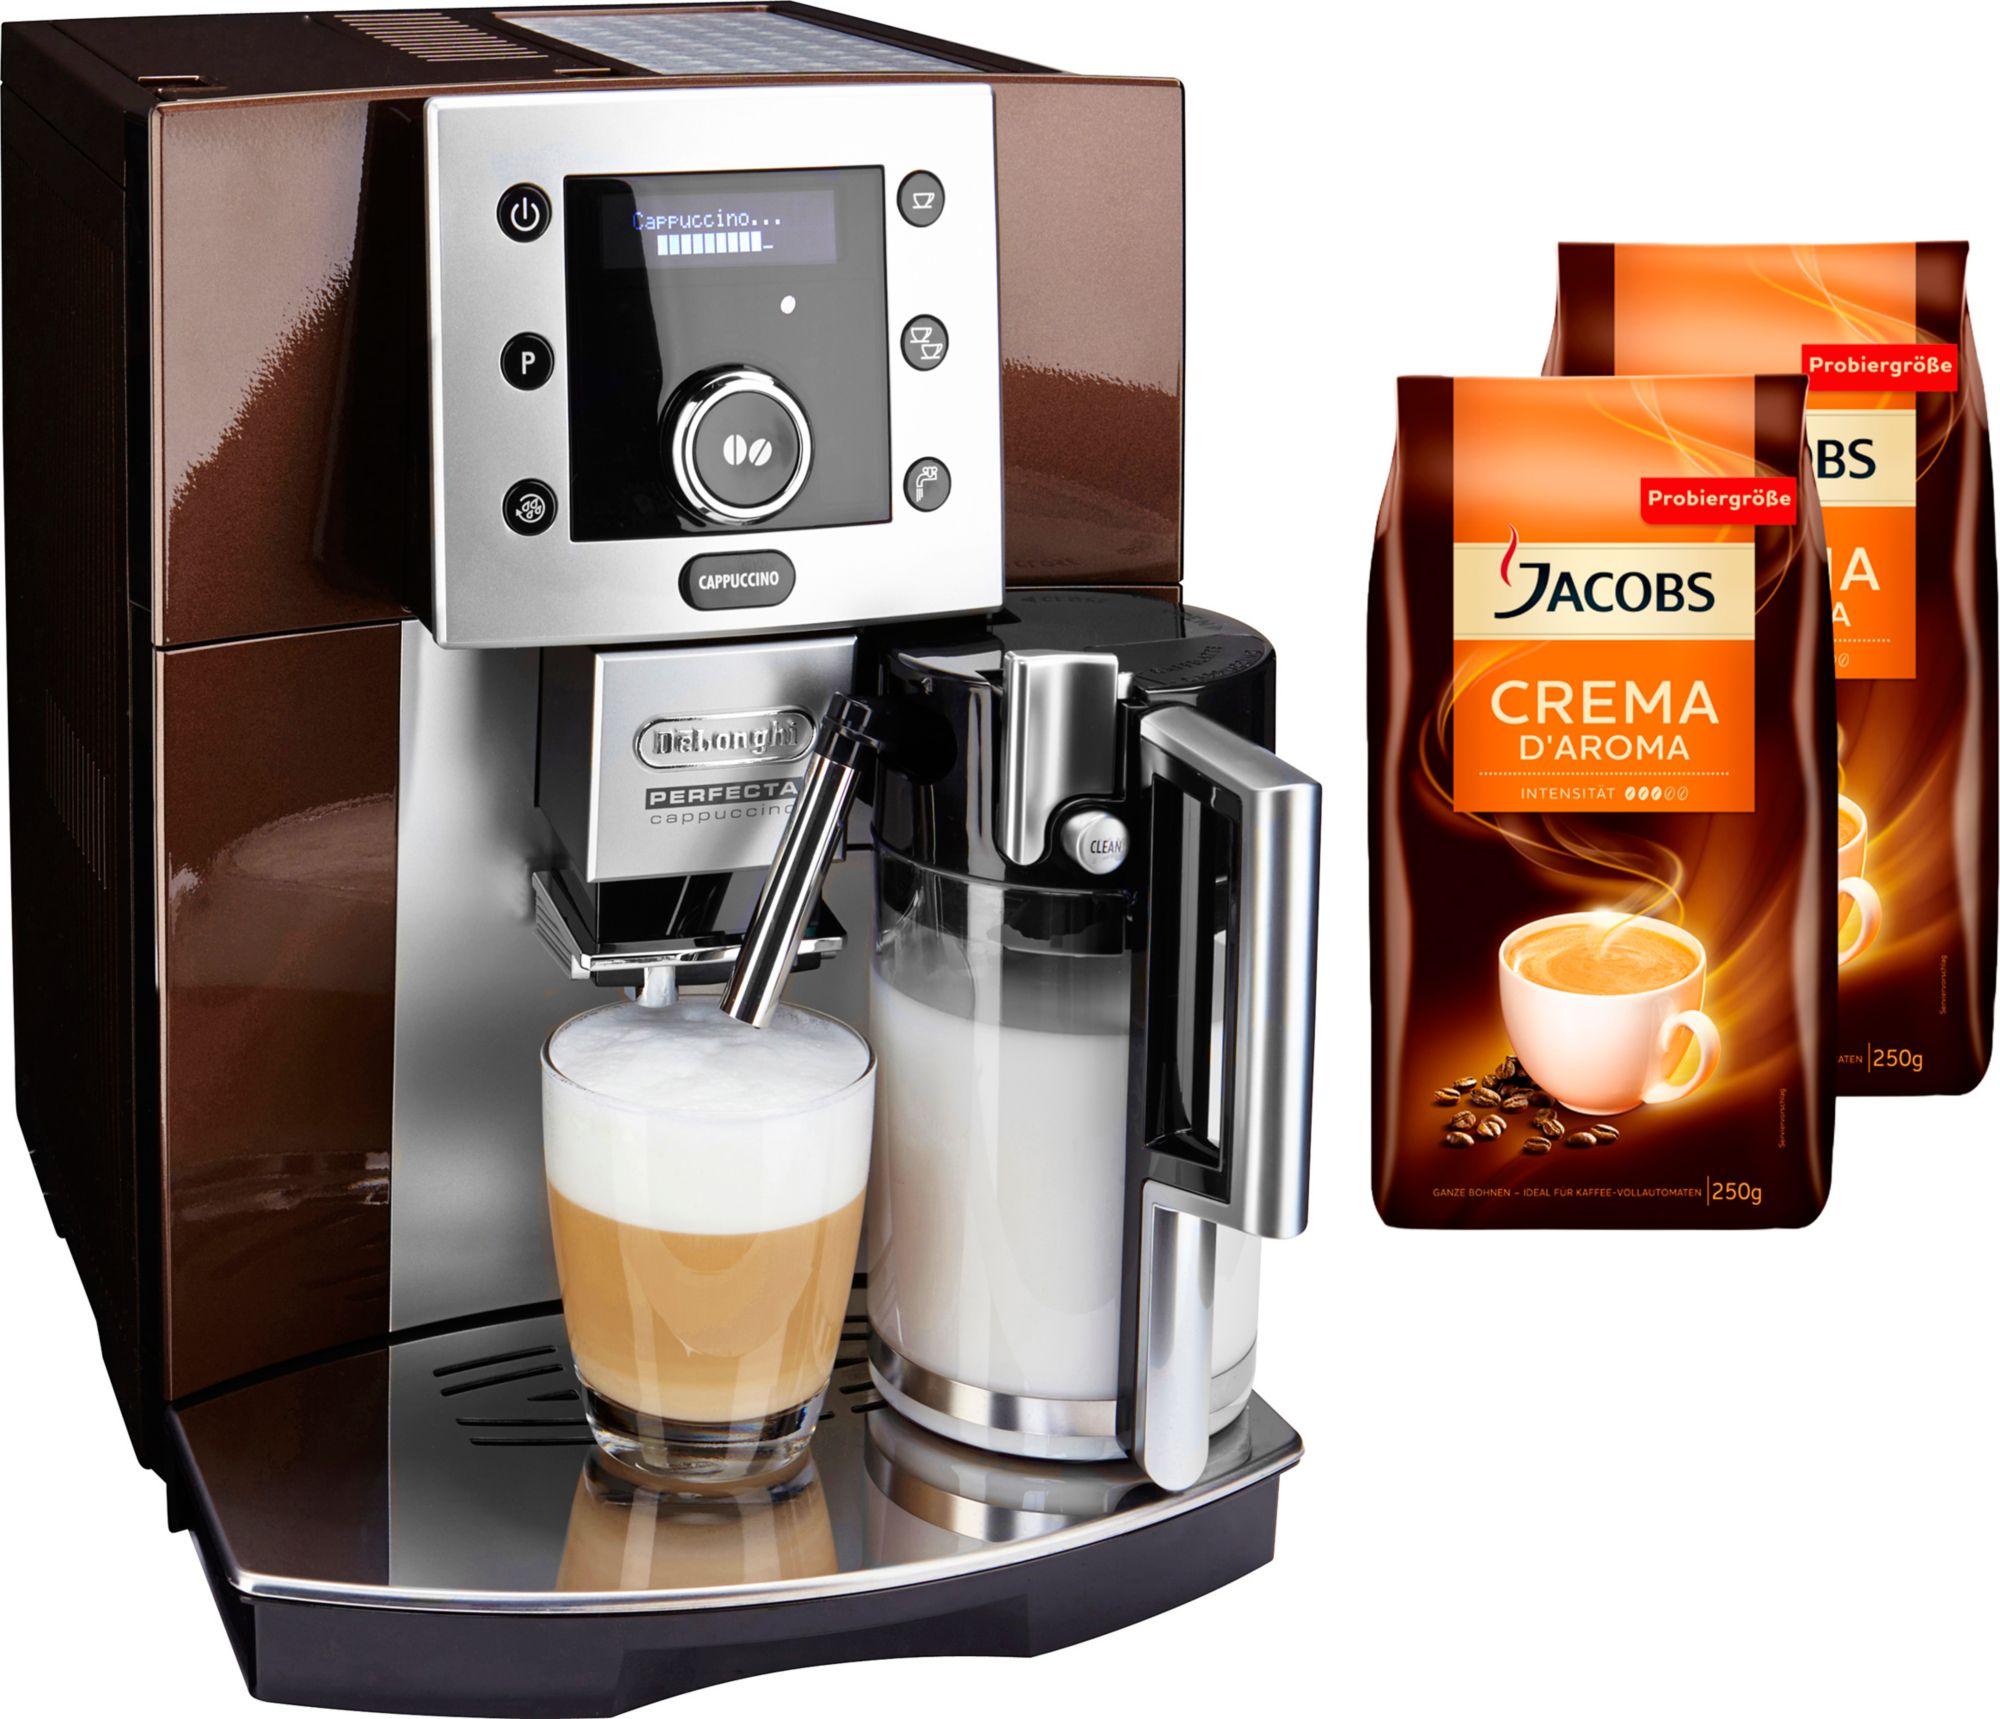 de longhi kaffeevollautomat perfecta esam 5550 schwab versand kaffeevollautomaten. Black Bedroom Furniture Sets. Home Design Ideas